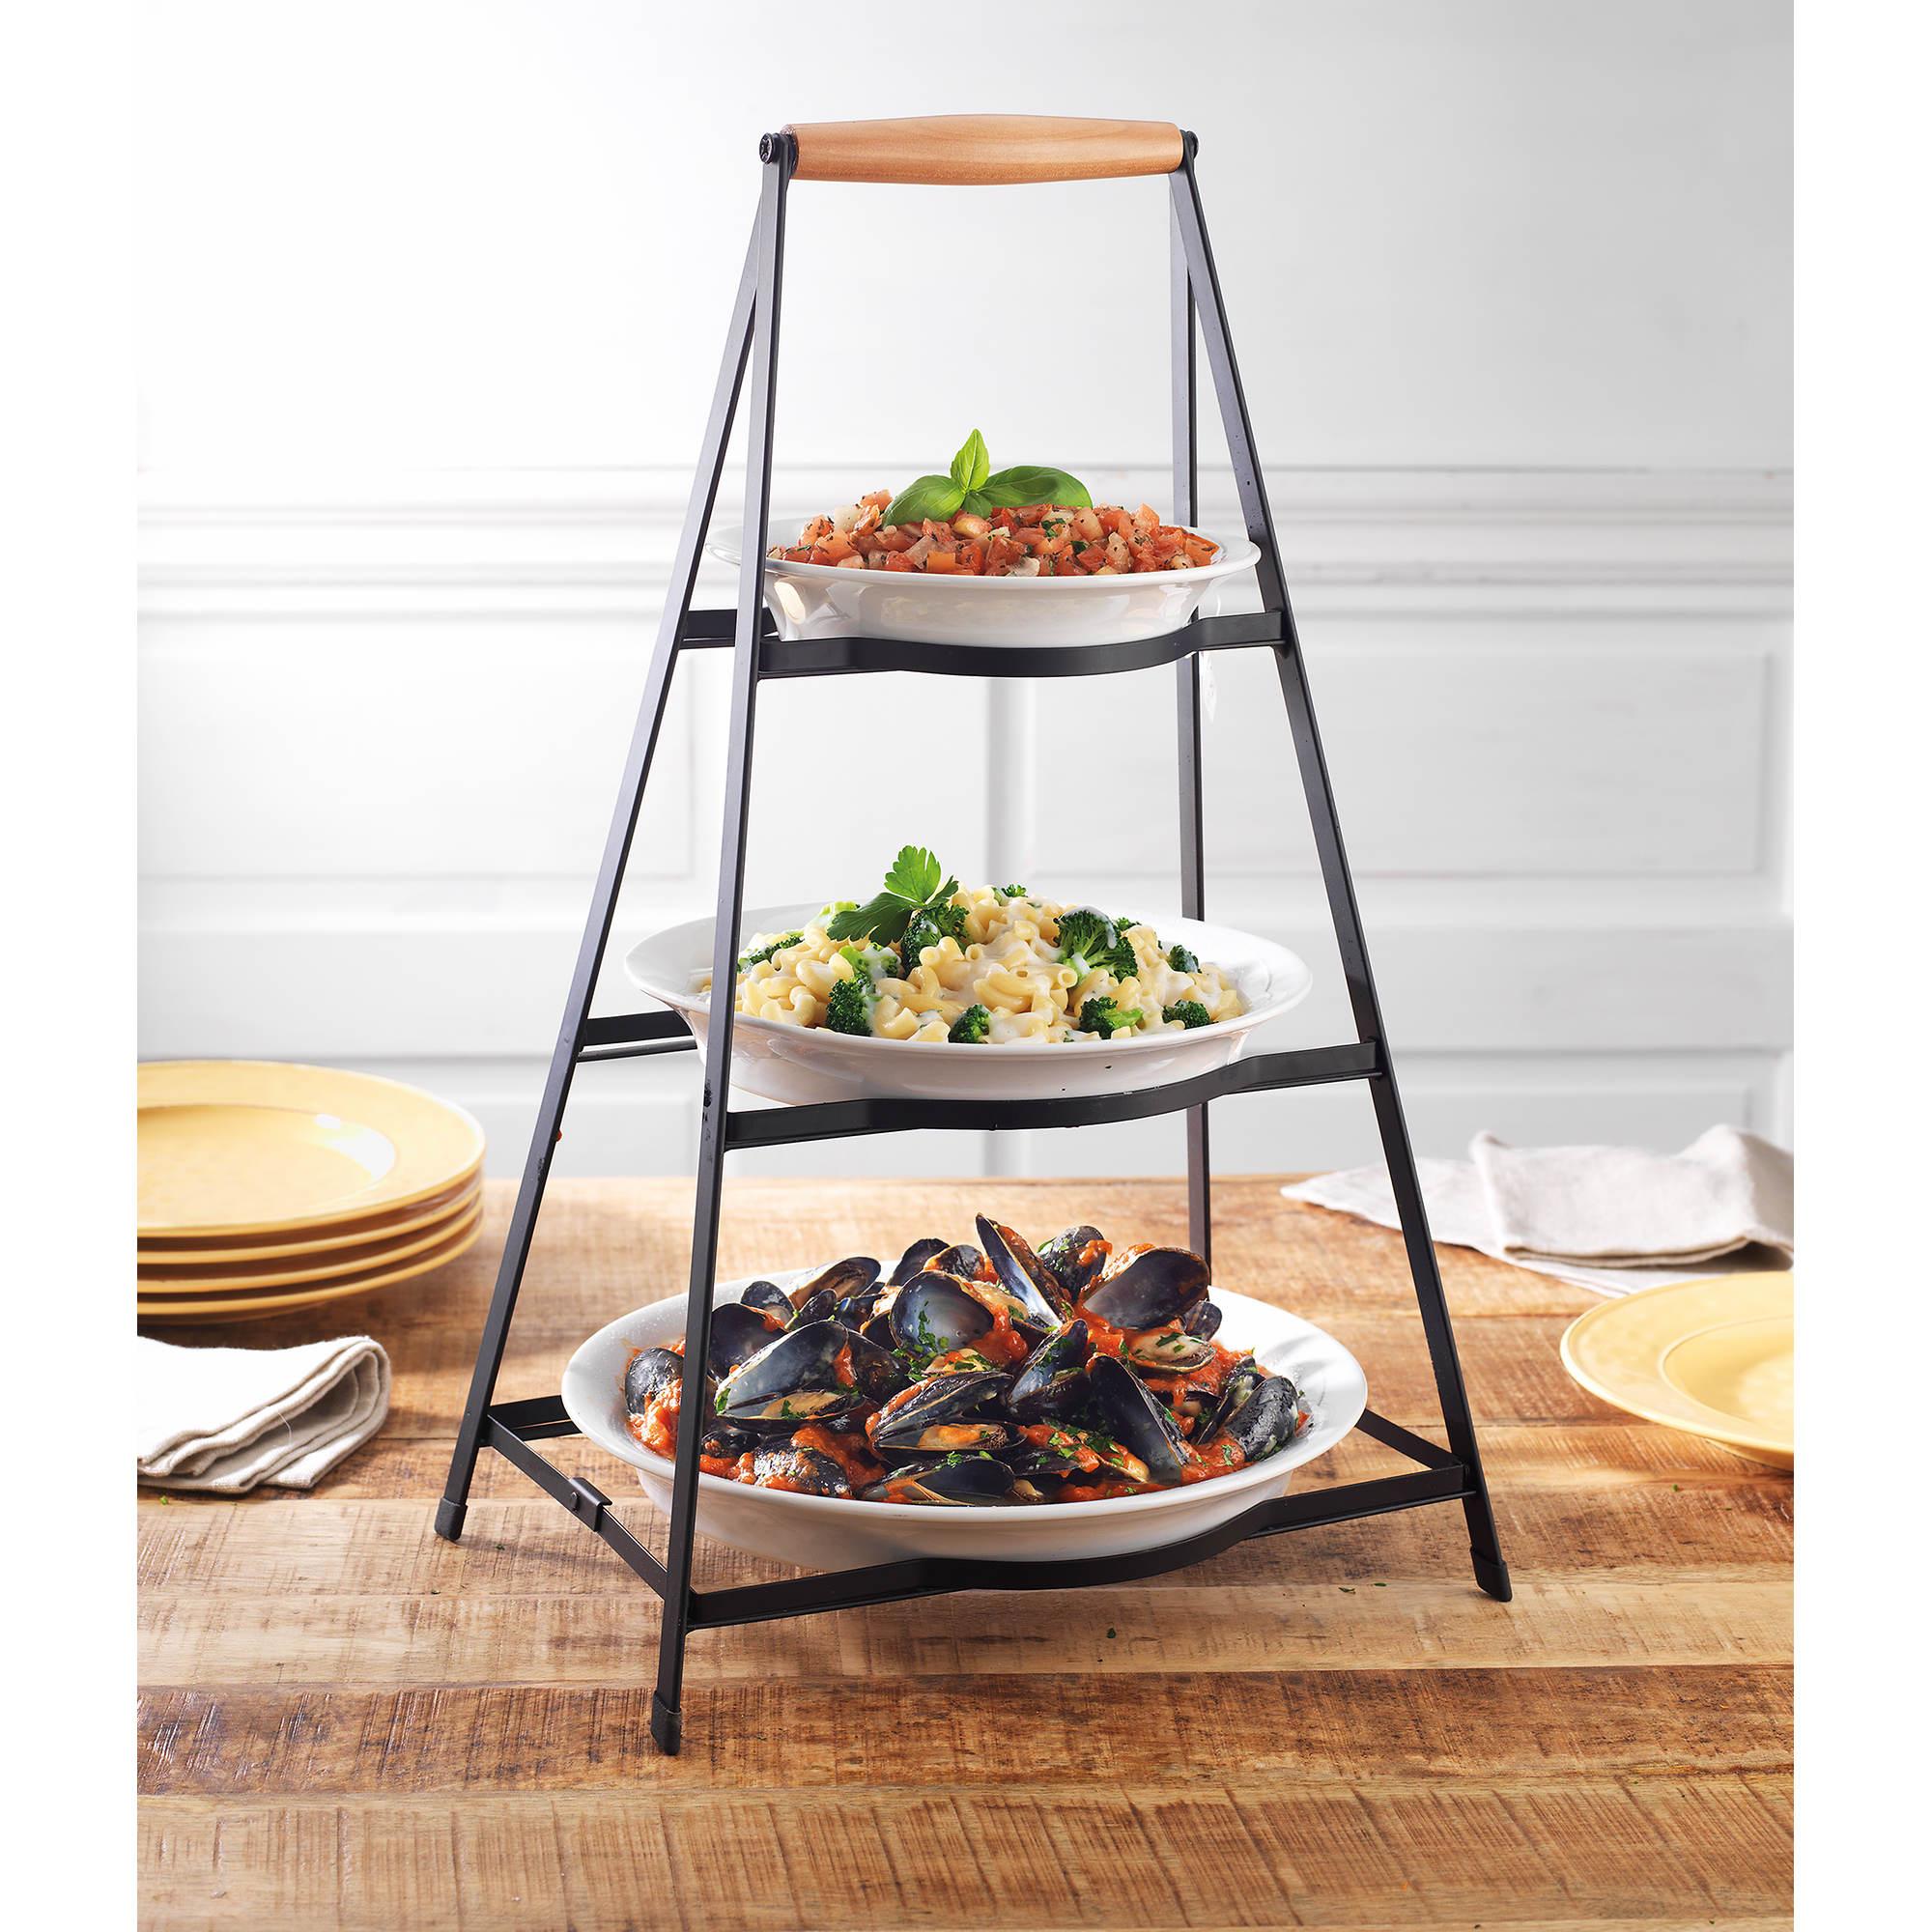 Phenomenal Berkley Jensen 3 Tier Collapsible Server With Plates Cjindustries Chair Design For Home Cjindustriesco